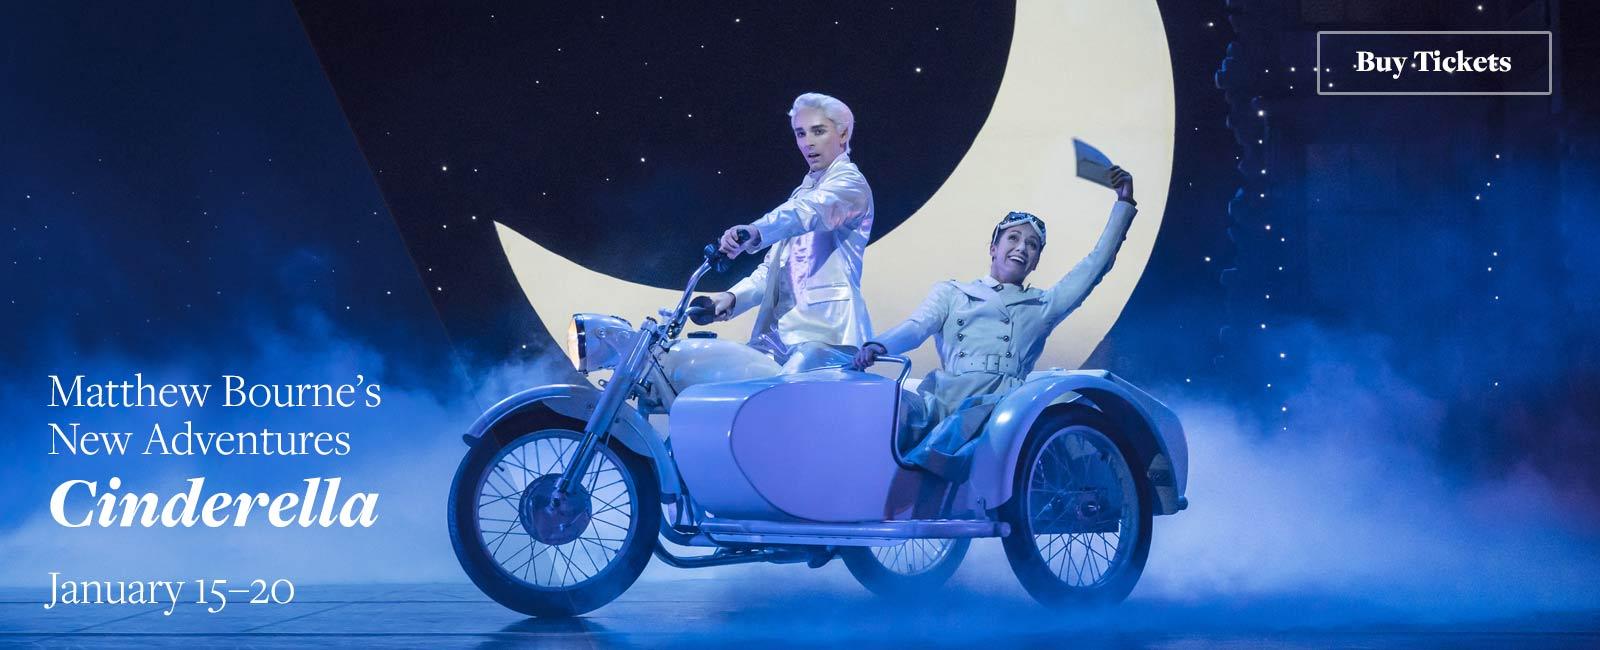 Matthew Bourne's New Adventures: Cinderella